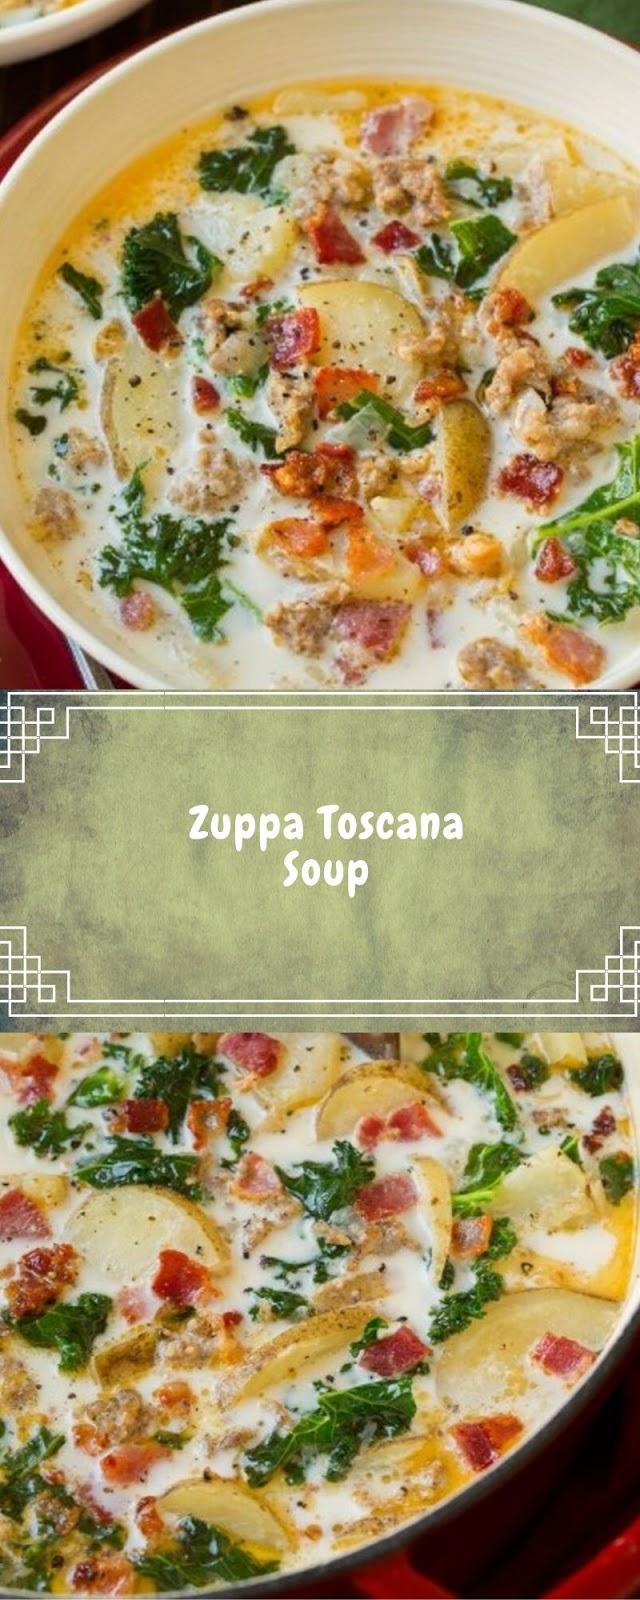 Zuppa Toscana Soup - Viral Food Recipes #zuppatoscanasoup